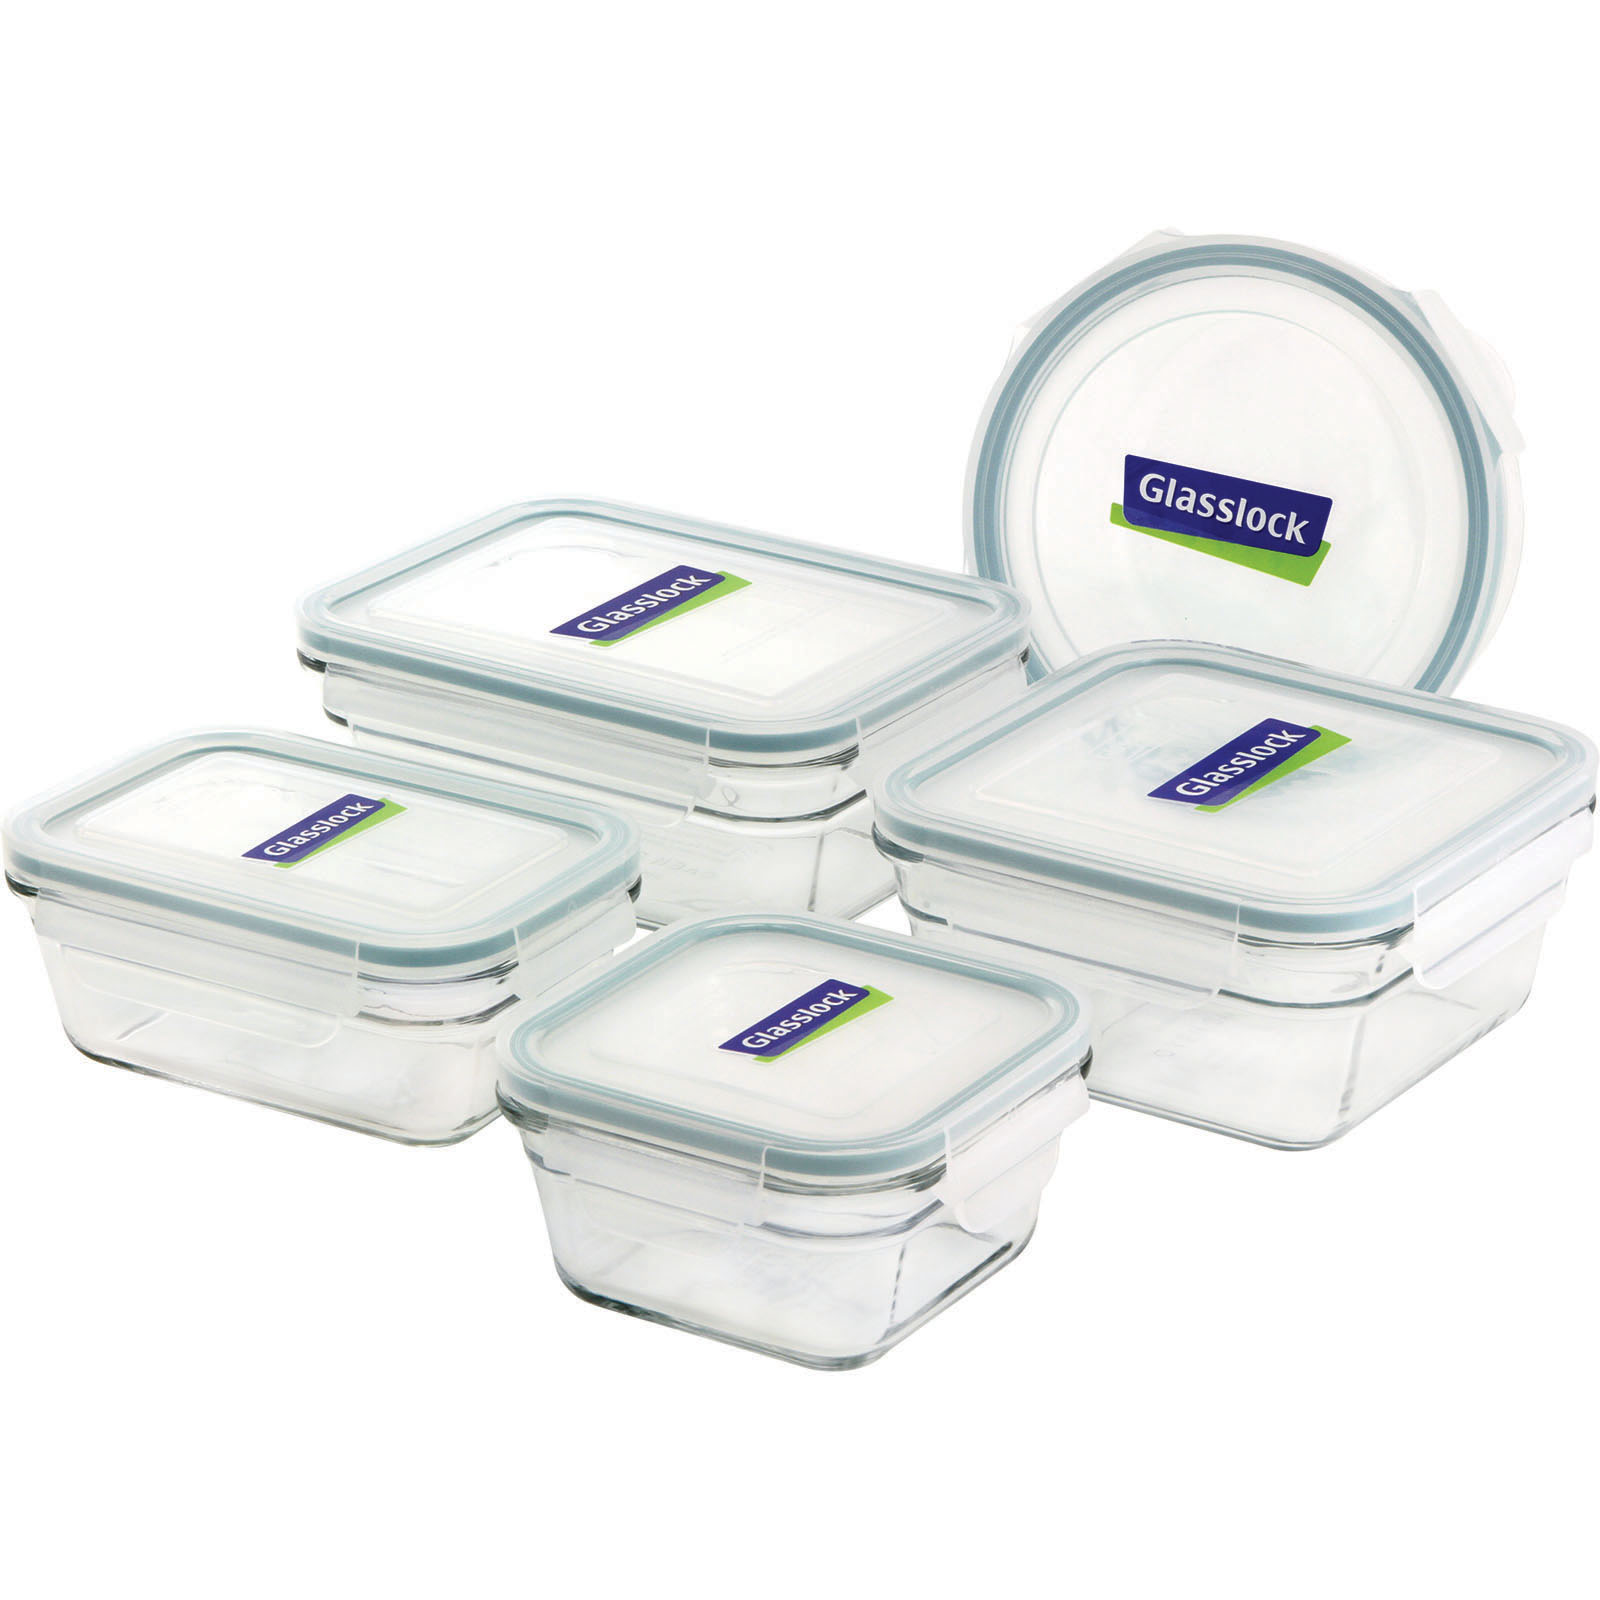 GlassLock Oven Safe 10pc box set Food Grocery Food Storage